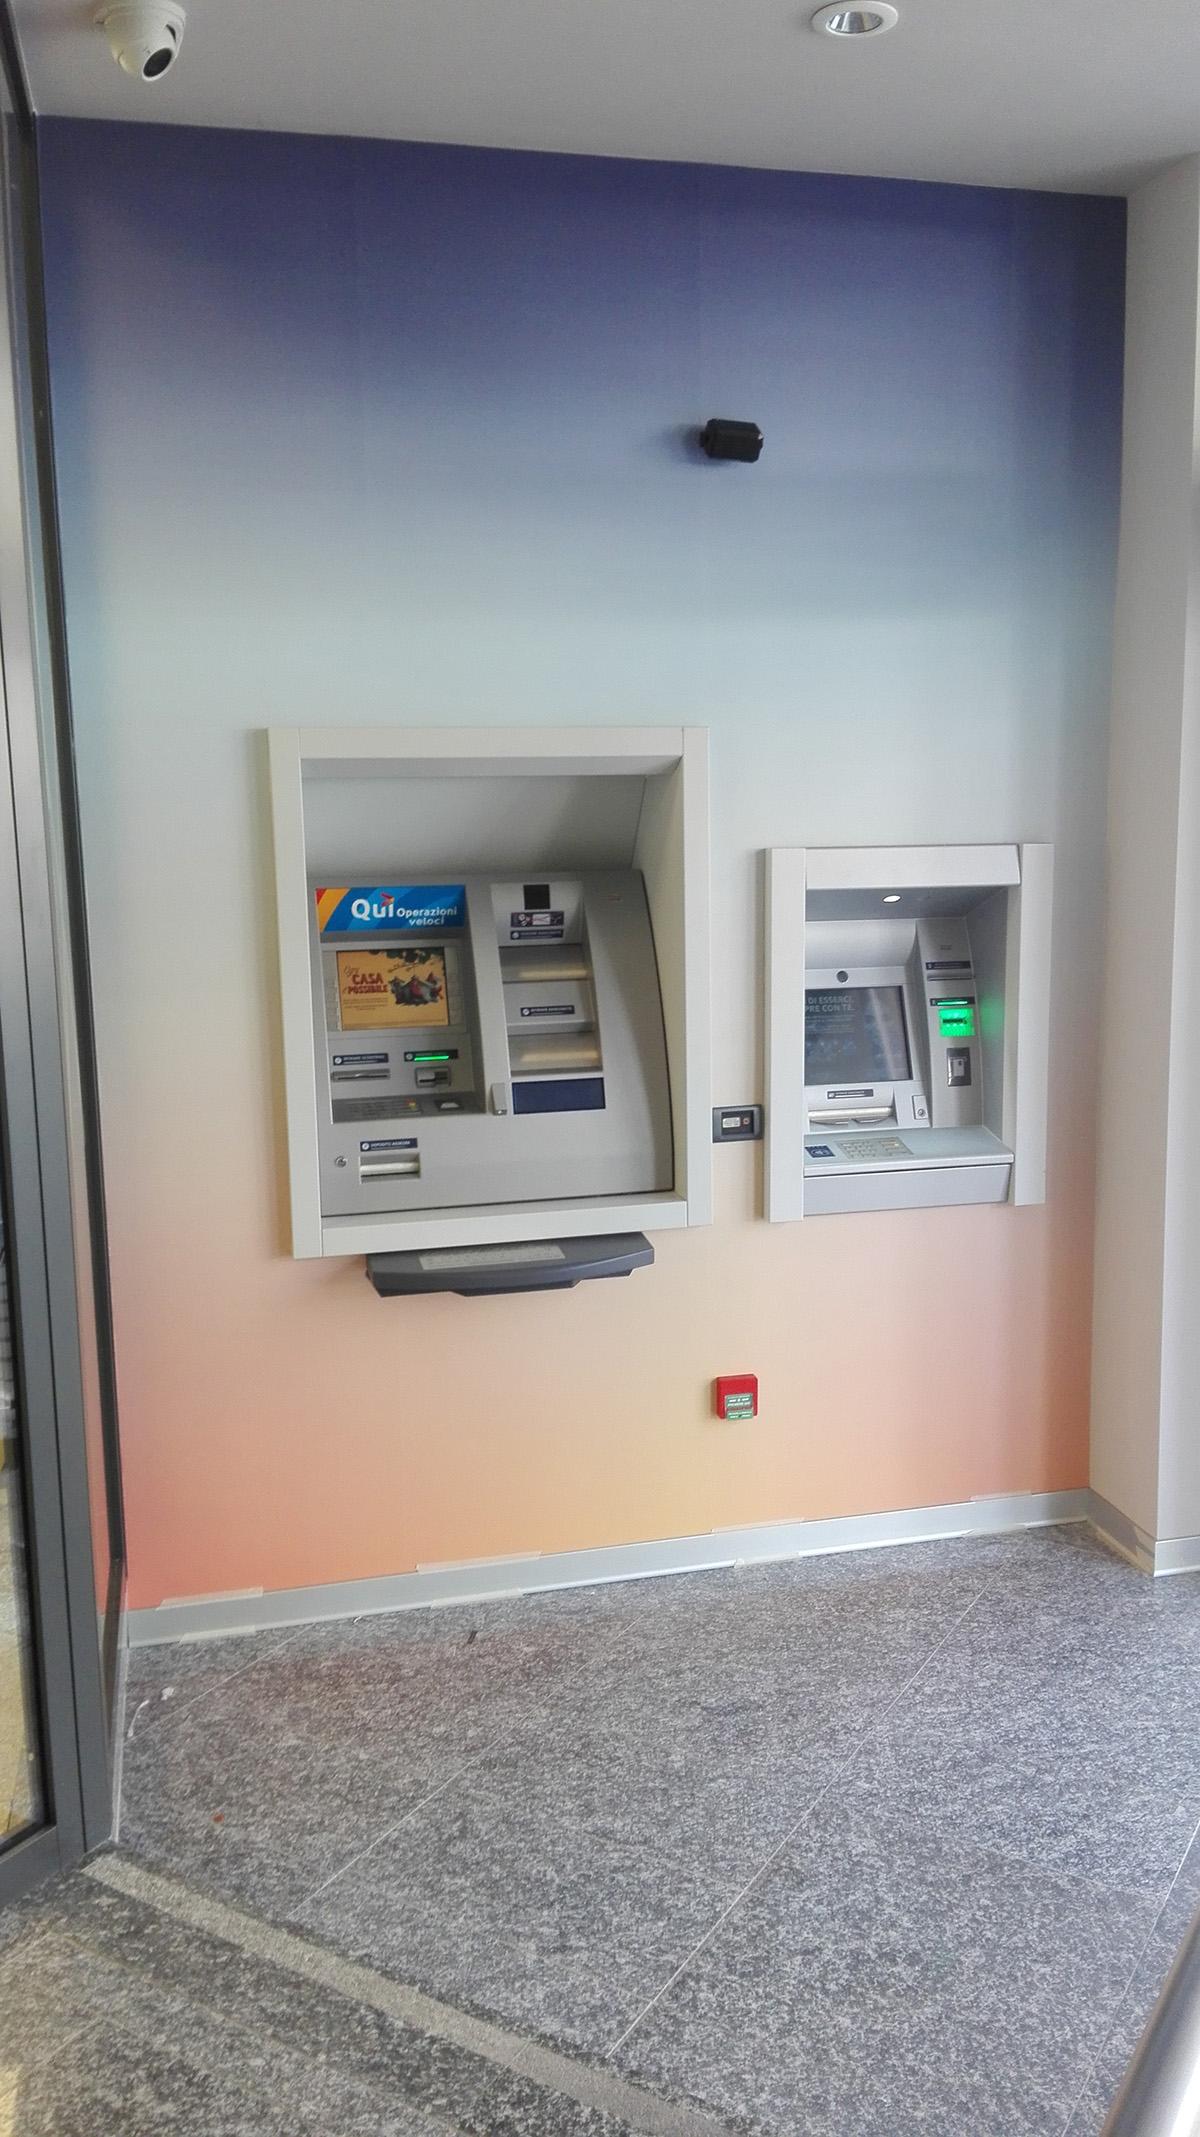 Perico-Renato-Calusco d'Adda (BG) - UBI Banca 5